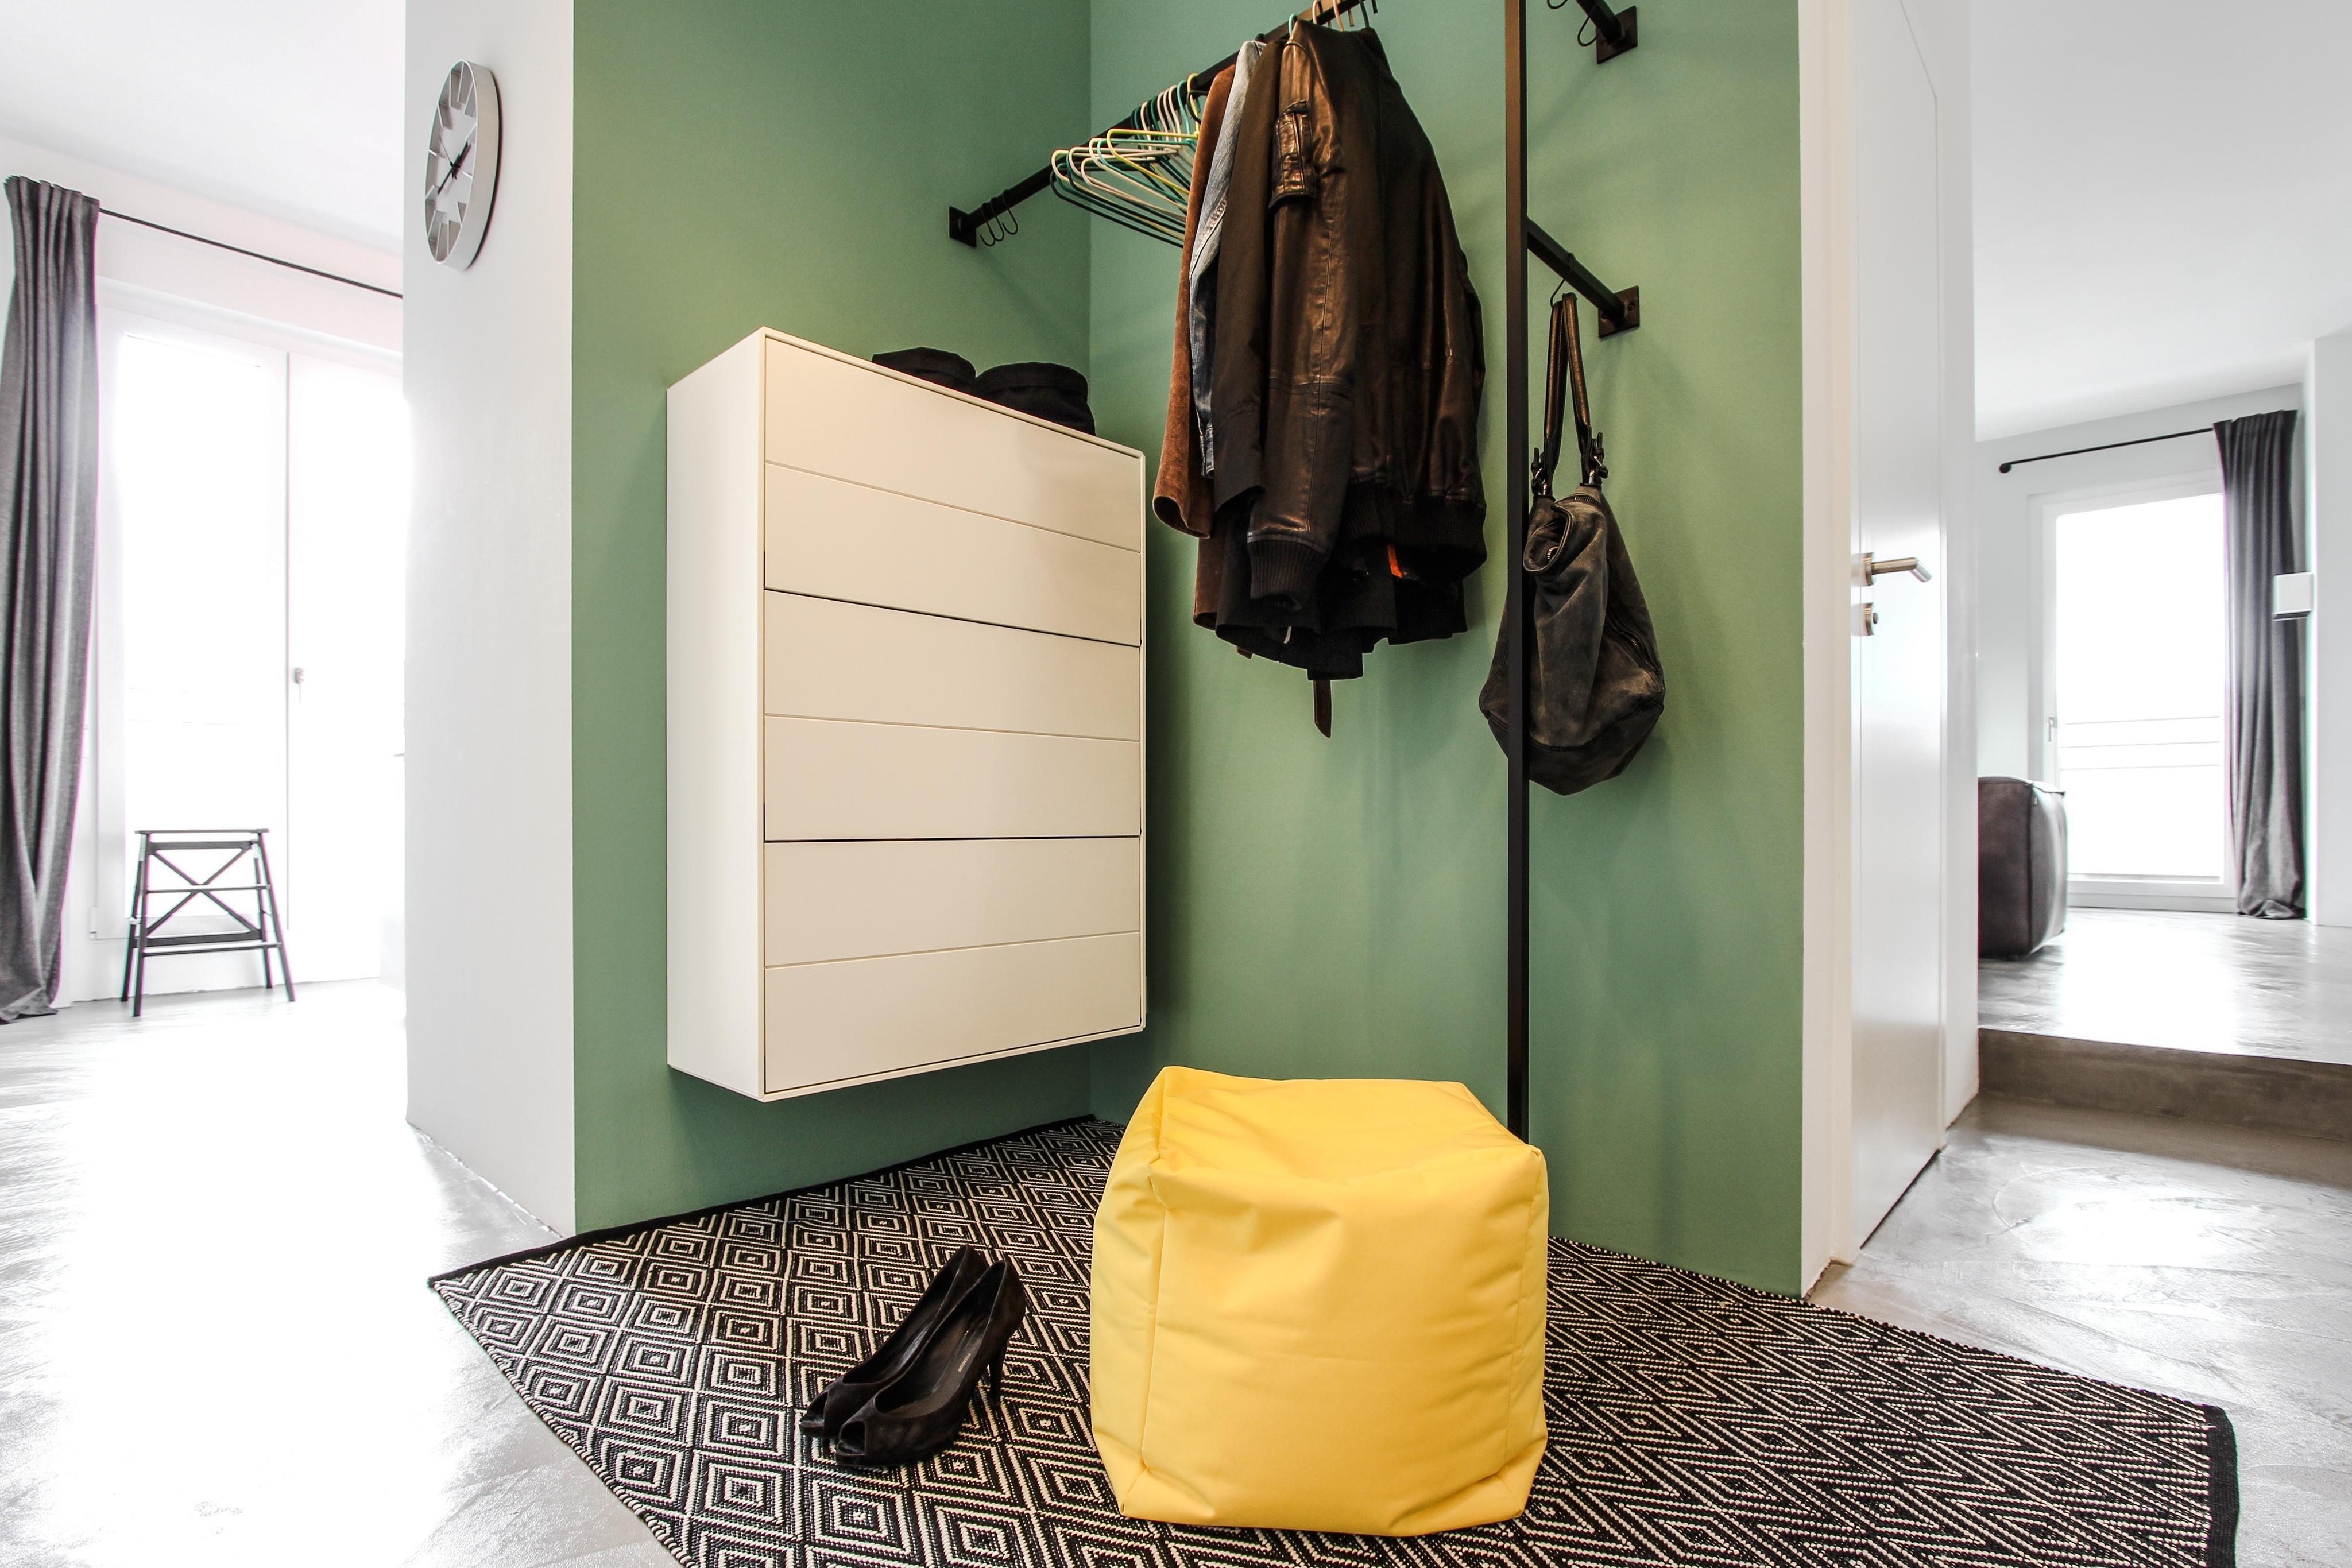 schuhschrank bilder ideen couchstyle. Black Bedroom Furniture Sets. Home Design Ideas